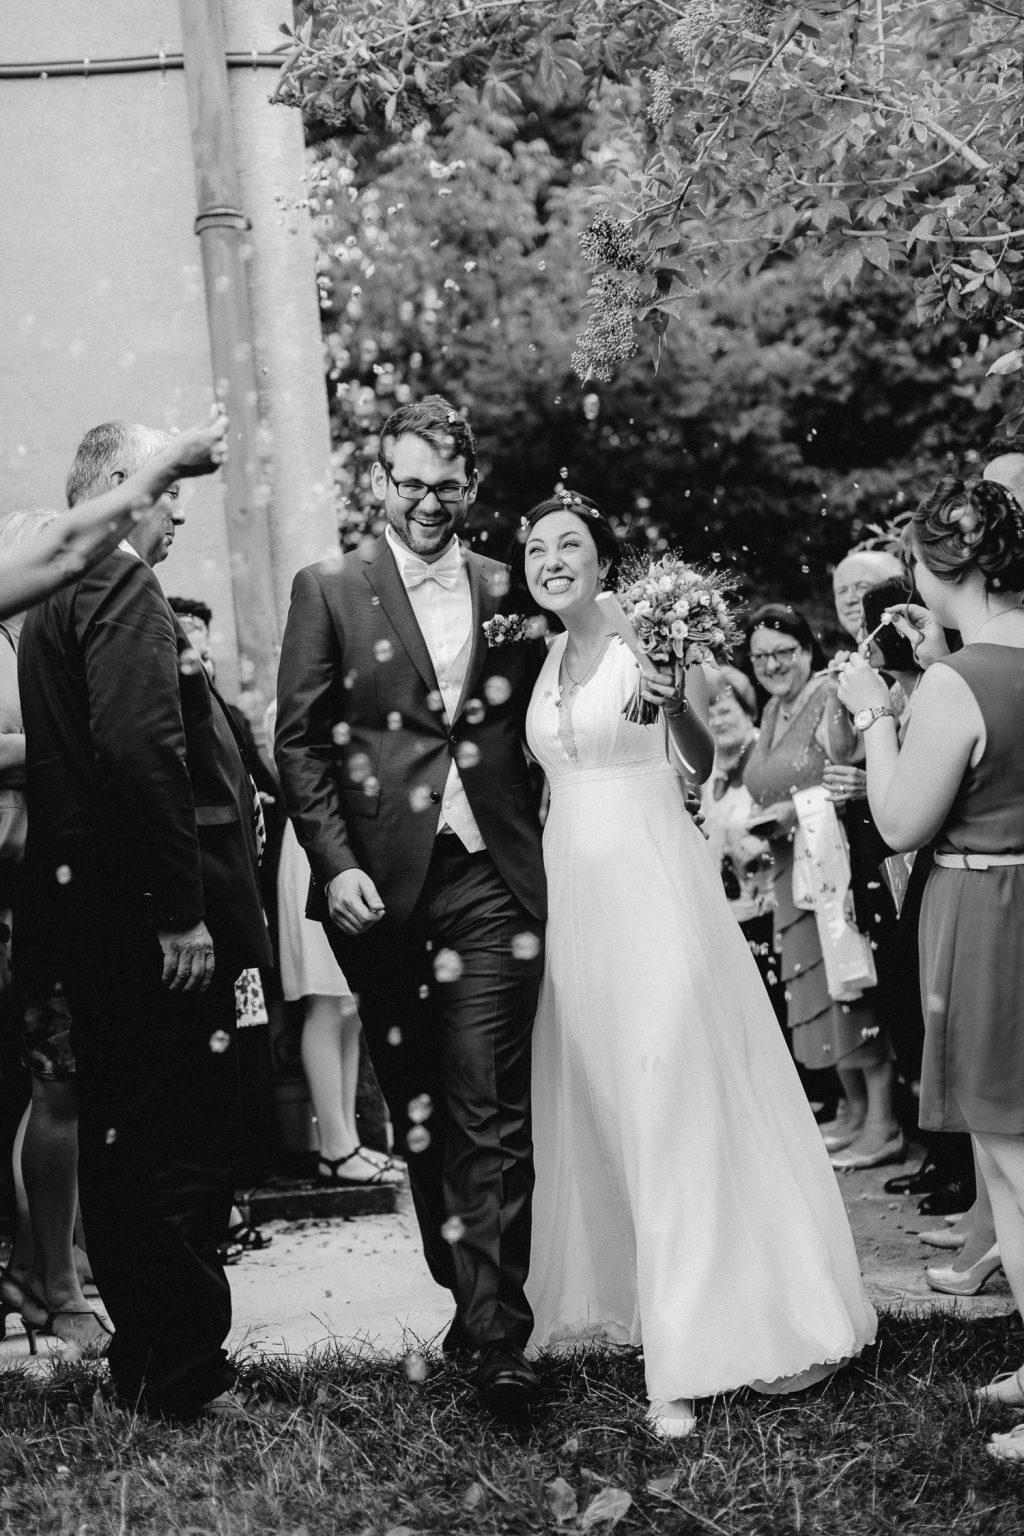 Barbara+Florian - BF-Hochzeit-Moebeldepot-026.jpg